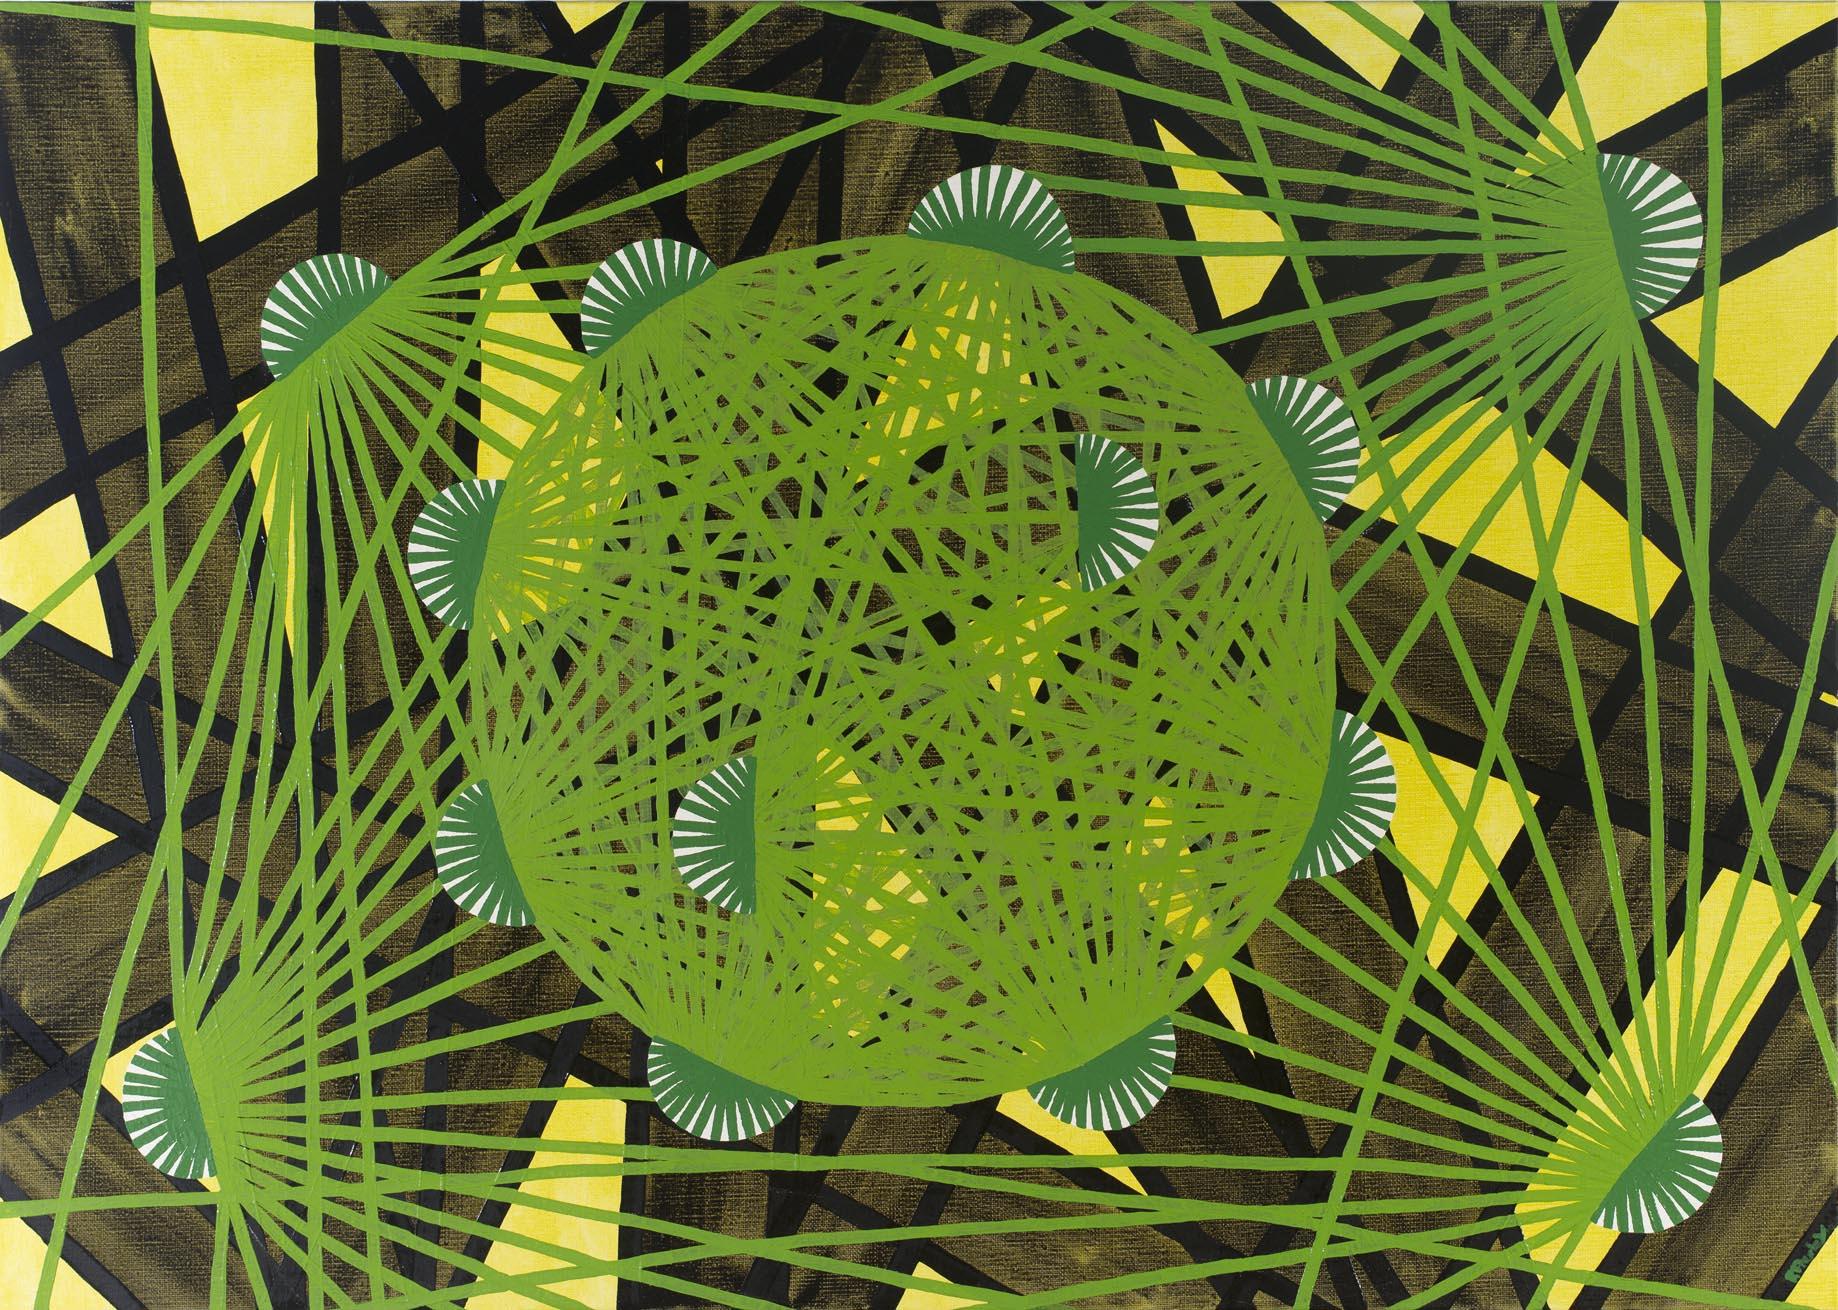 Ryan Presley, Denggiti, 2012, Oil on Linen, 100 x 70.5 cm